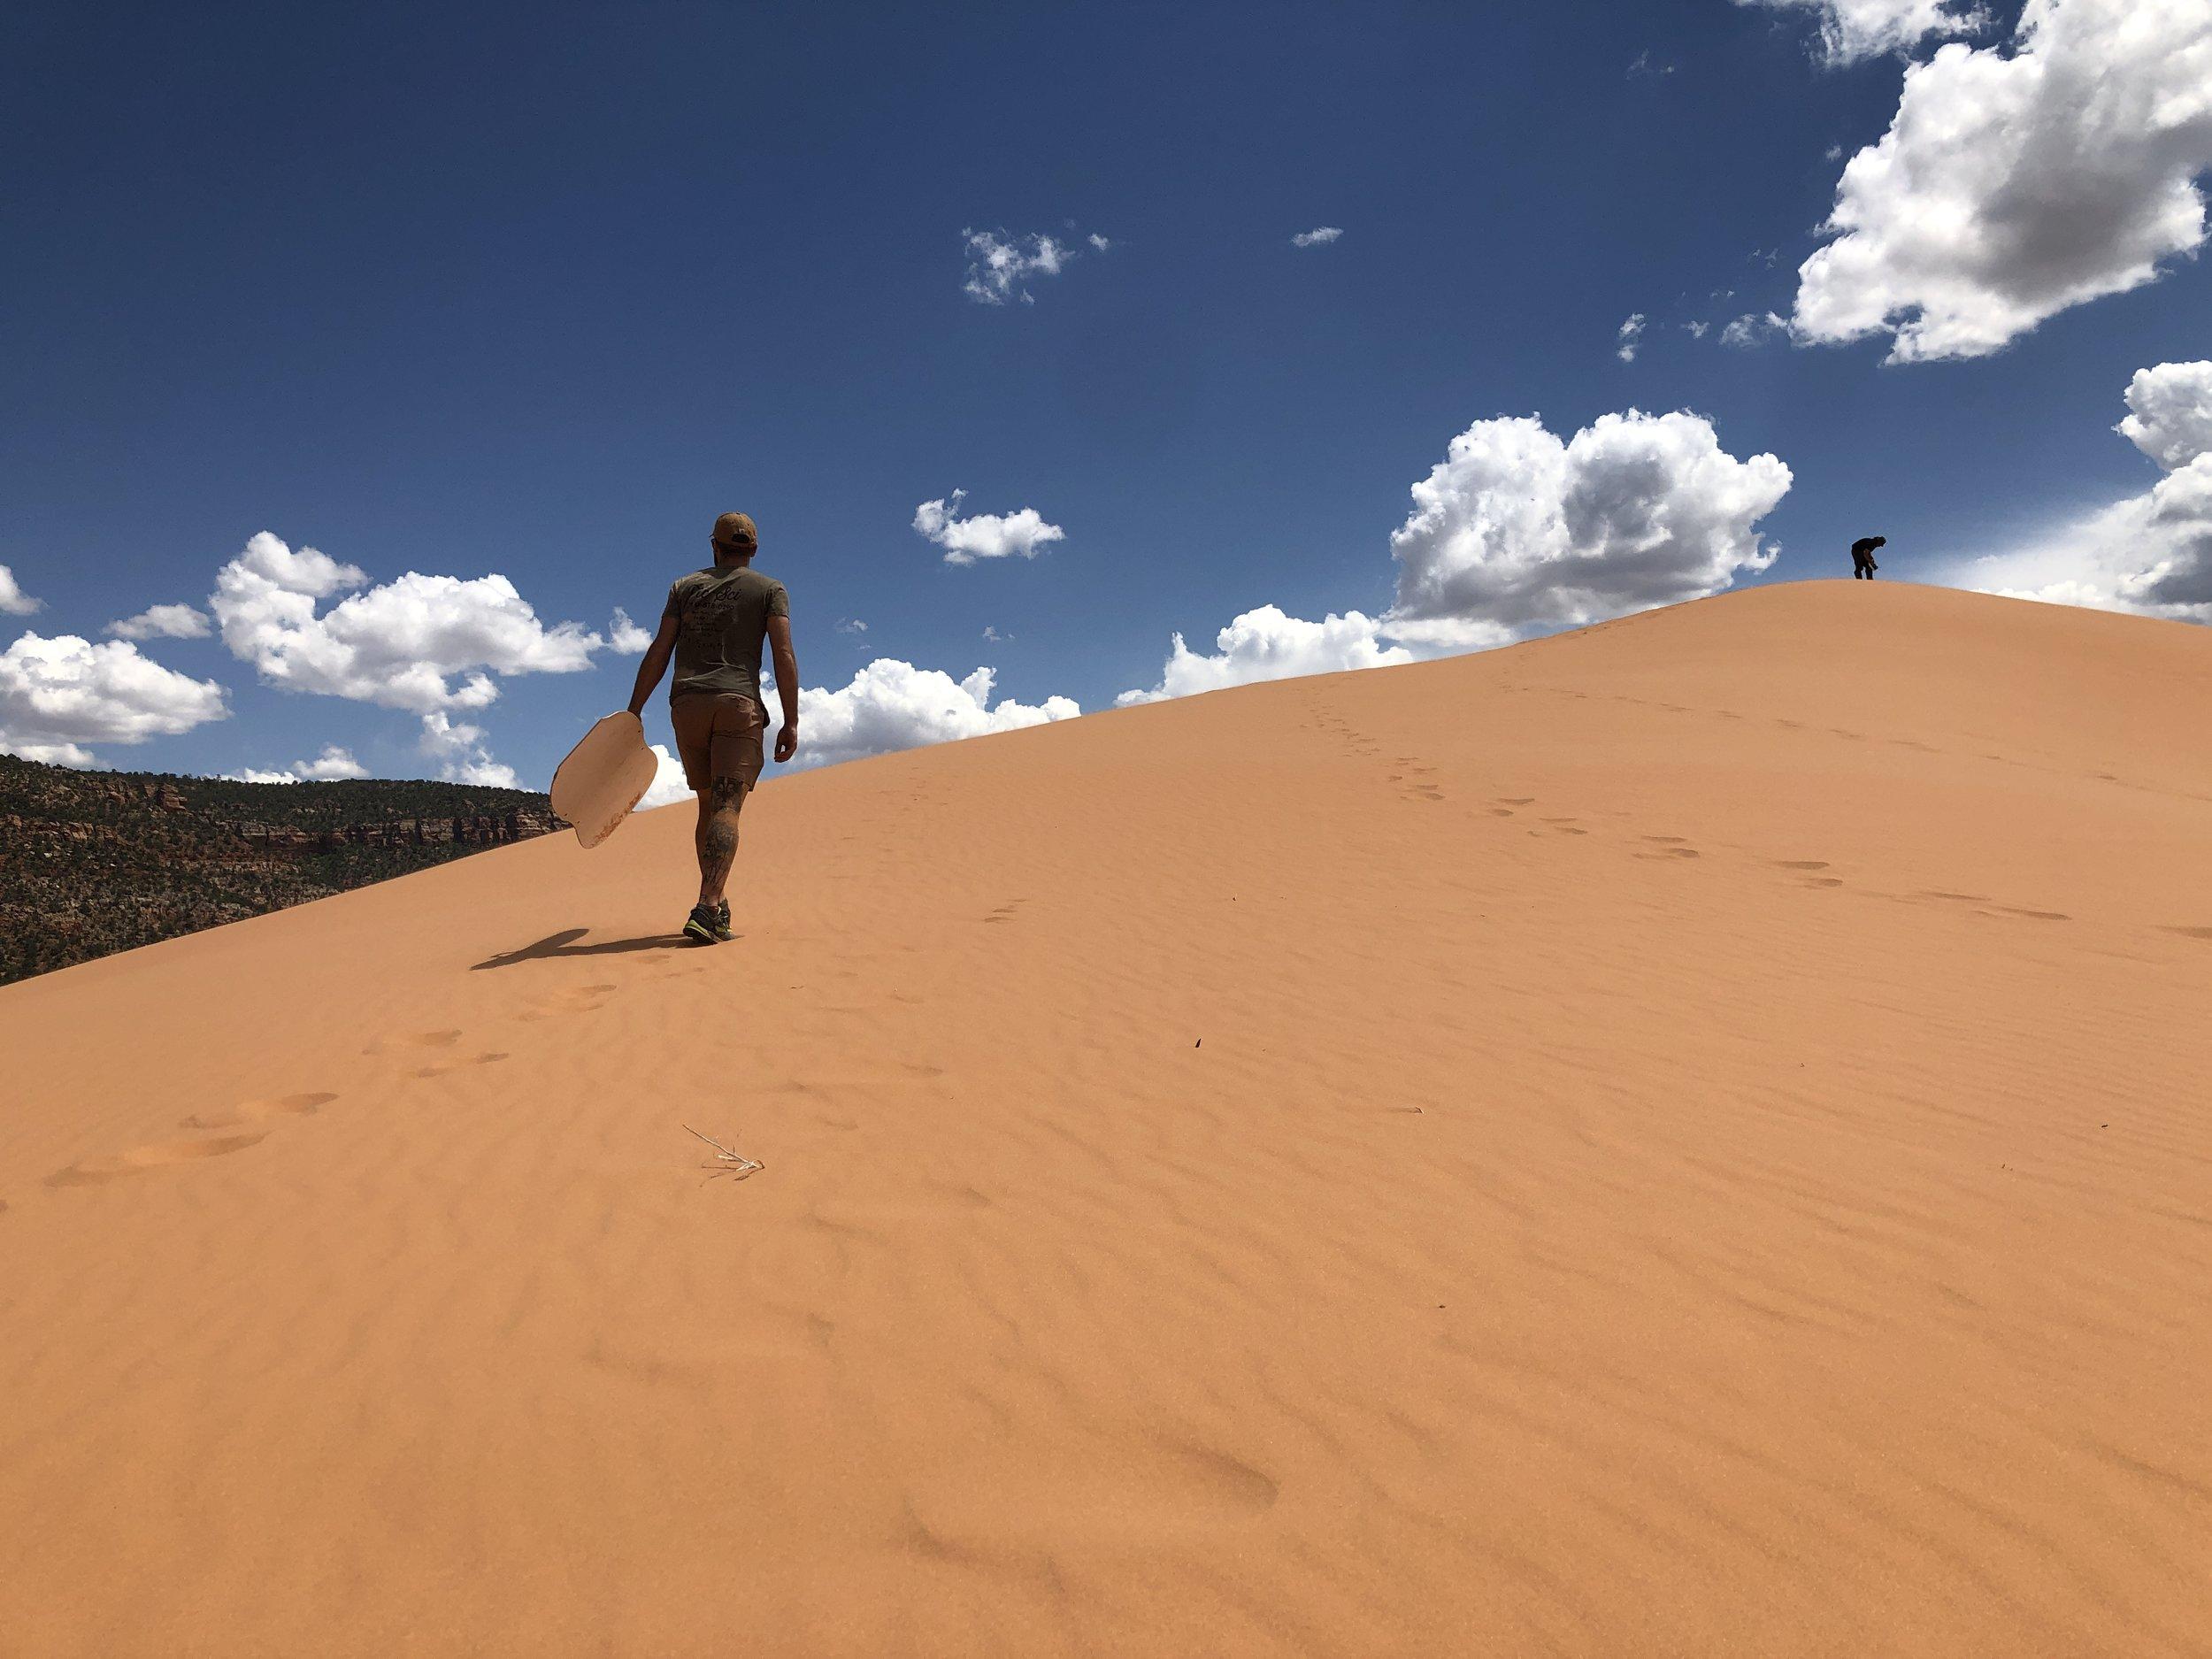 sand-boarding-surfing-coral-pink-sand-dunes-utah